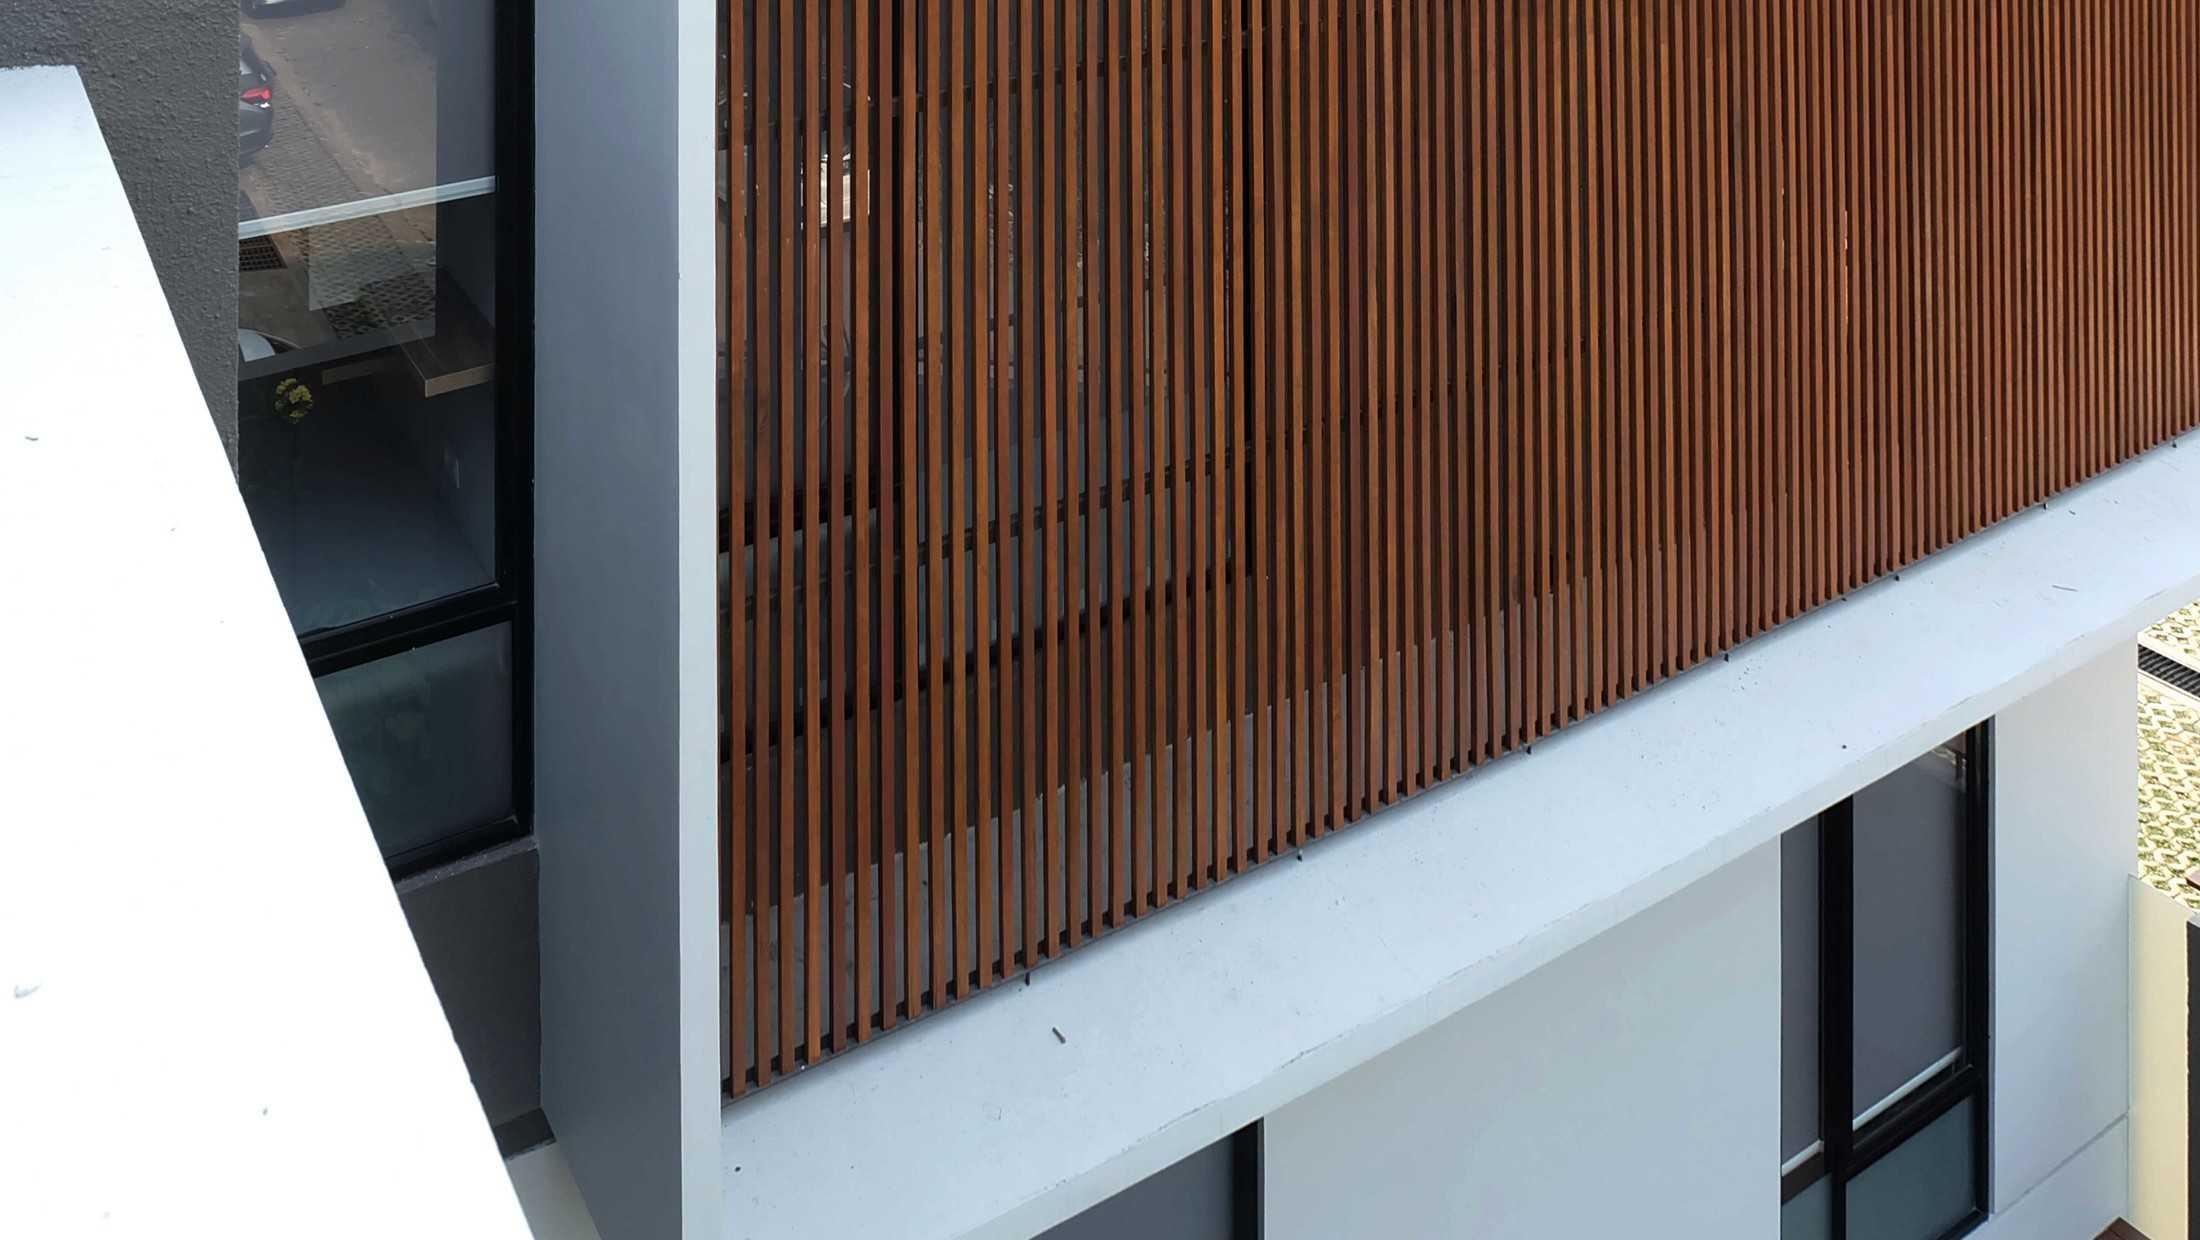 Gohte Architects Vk Homes Lippo Karawaci, Binong, Kec. Curug, Tangerang, Banten, Indonesia Lippo Karawaci, Binong, Kec. Curug, Tangerang, Banten, Indonesia Gohte-Architects-Vk-Homes  96617